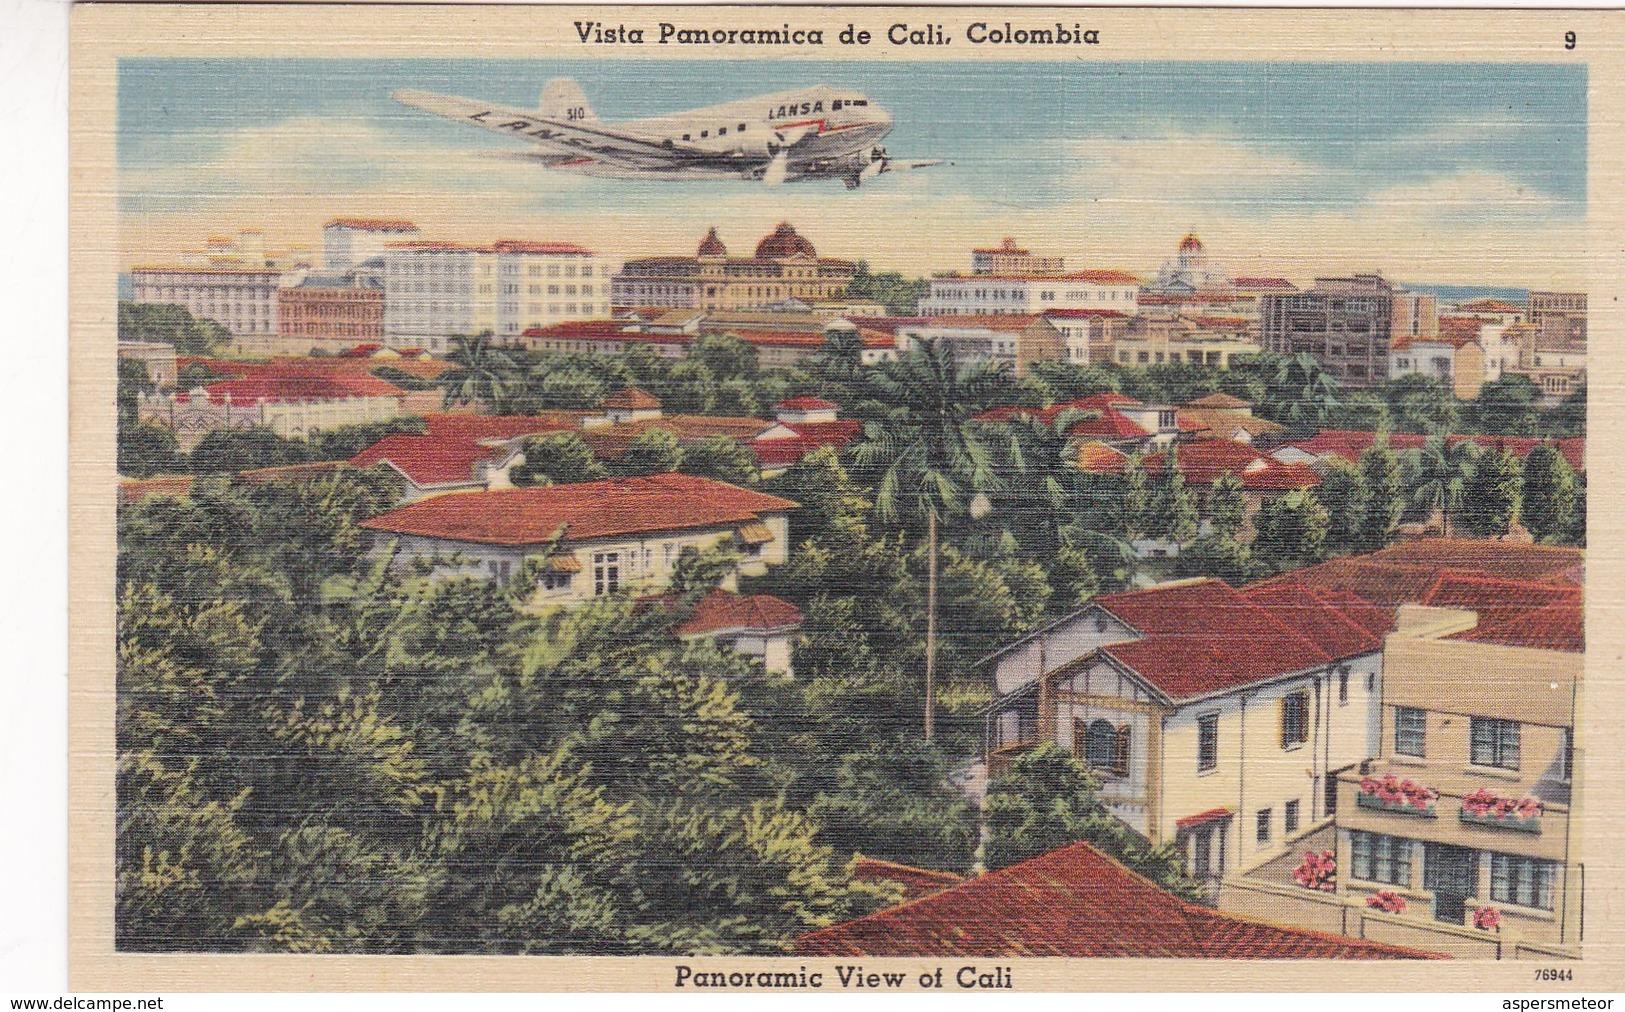 VISTA PANORAMICA DE CALI, COLOMBIA. LANSA LTD AIRPLANE. TICHNOR QUALITY VIEWS. CIRCA 1950s - BLEUP - Colombie